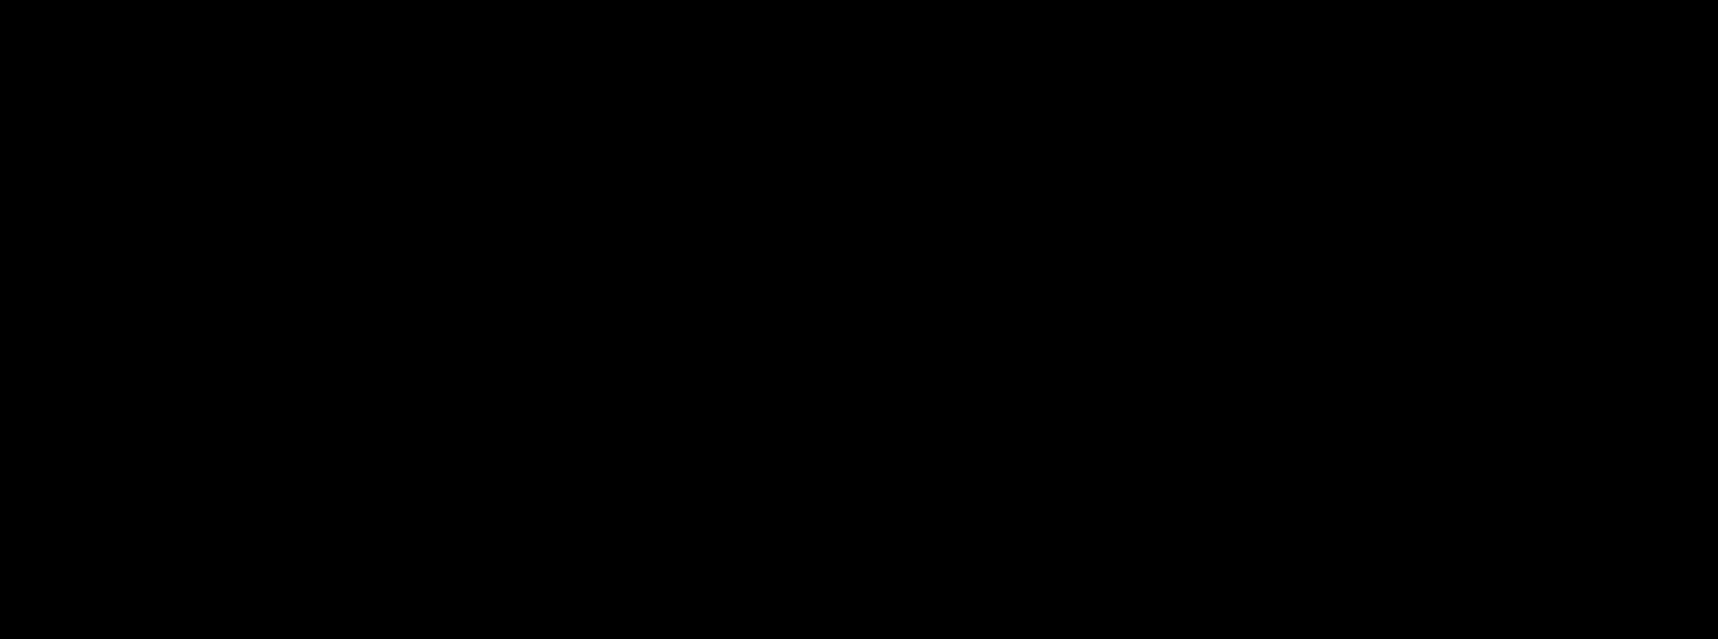 (S)-Amisulpride